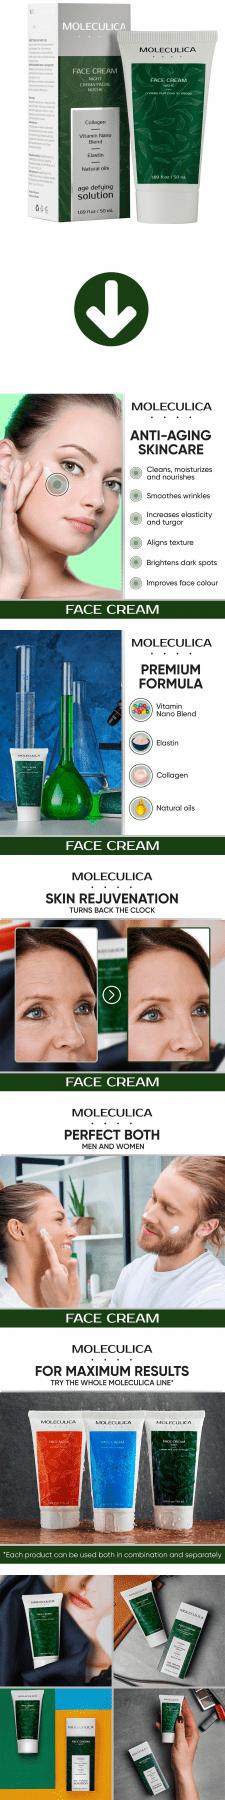 Листинг Amazon - Moleculica Night Face Cream